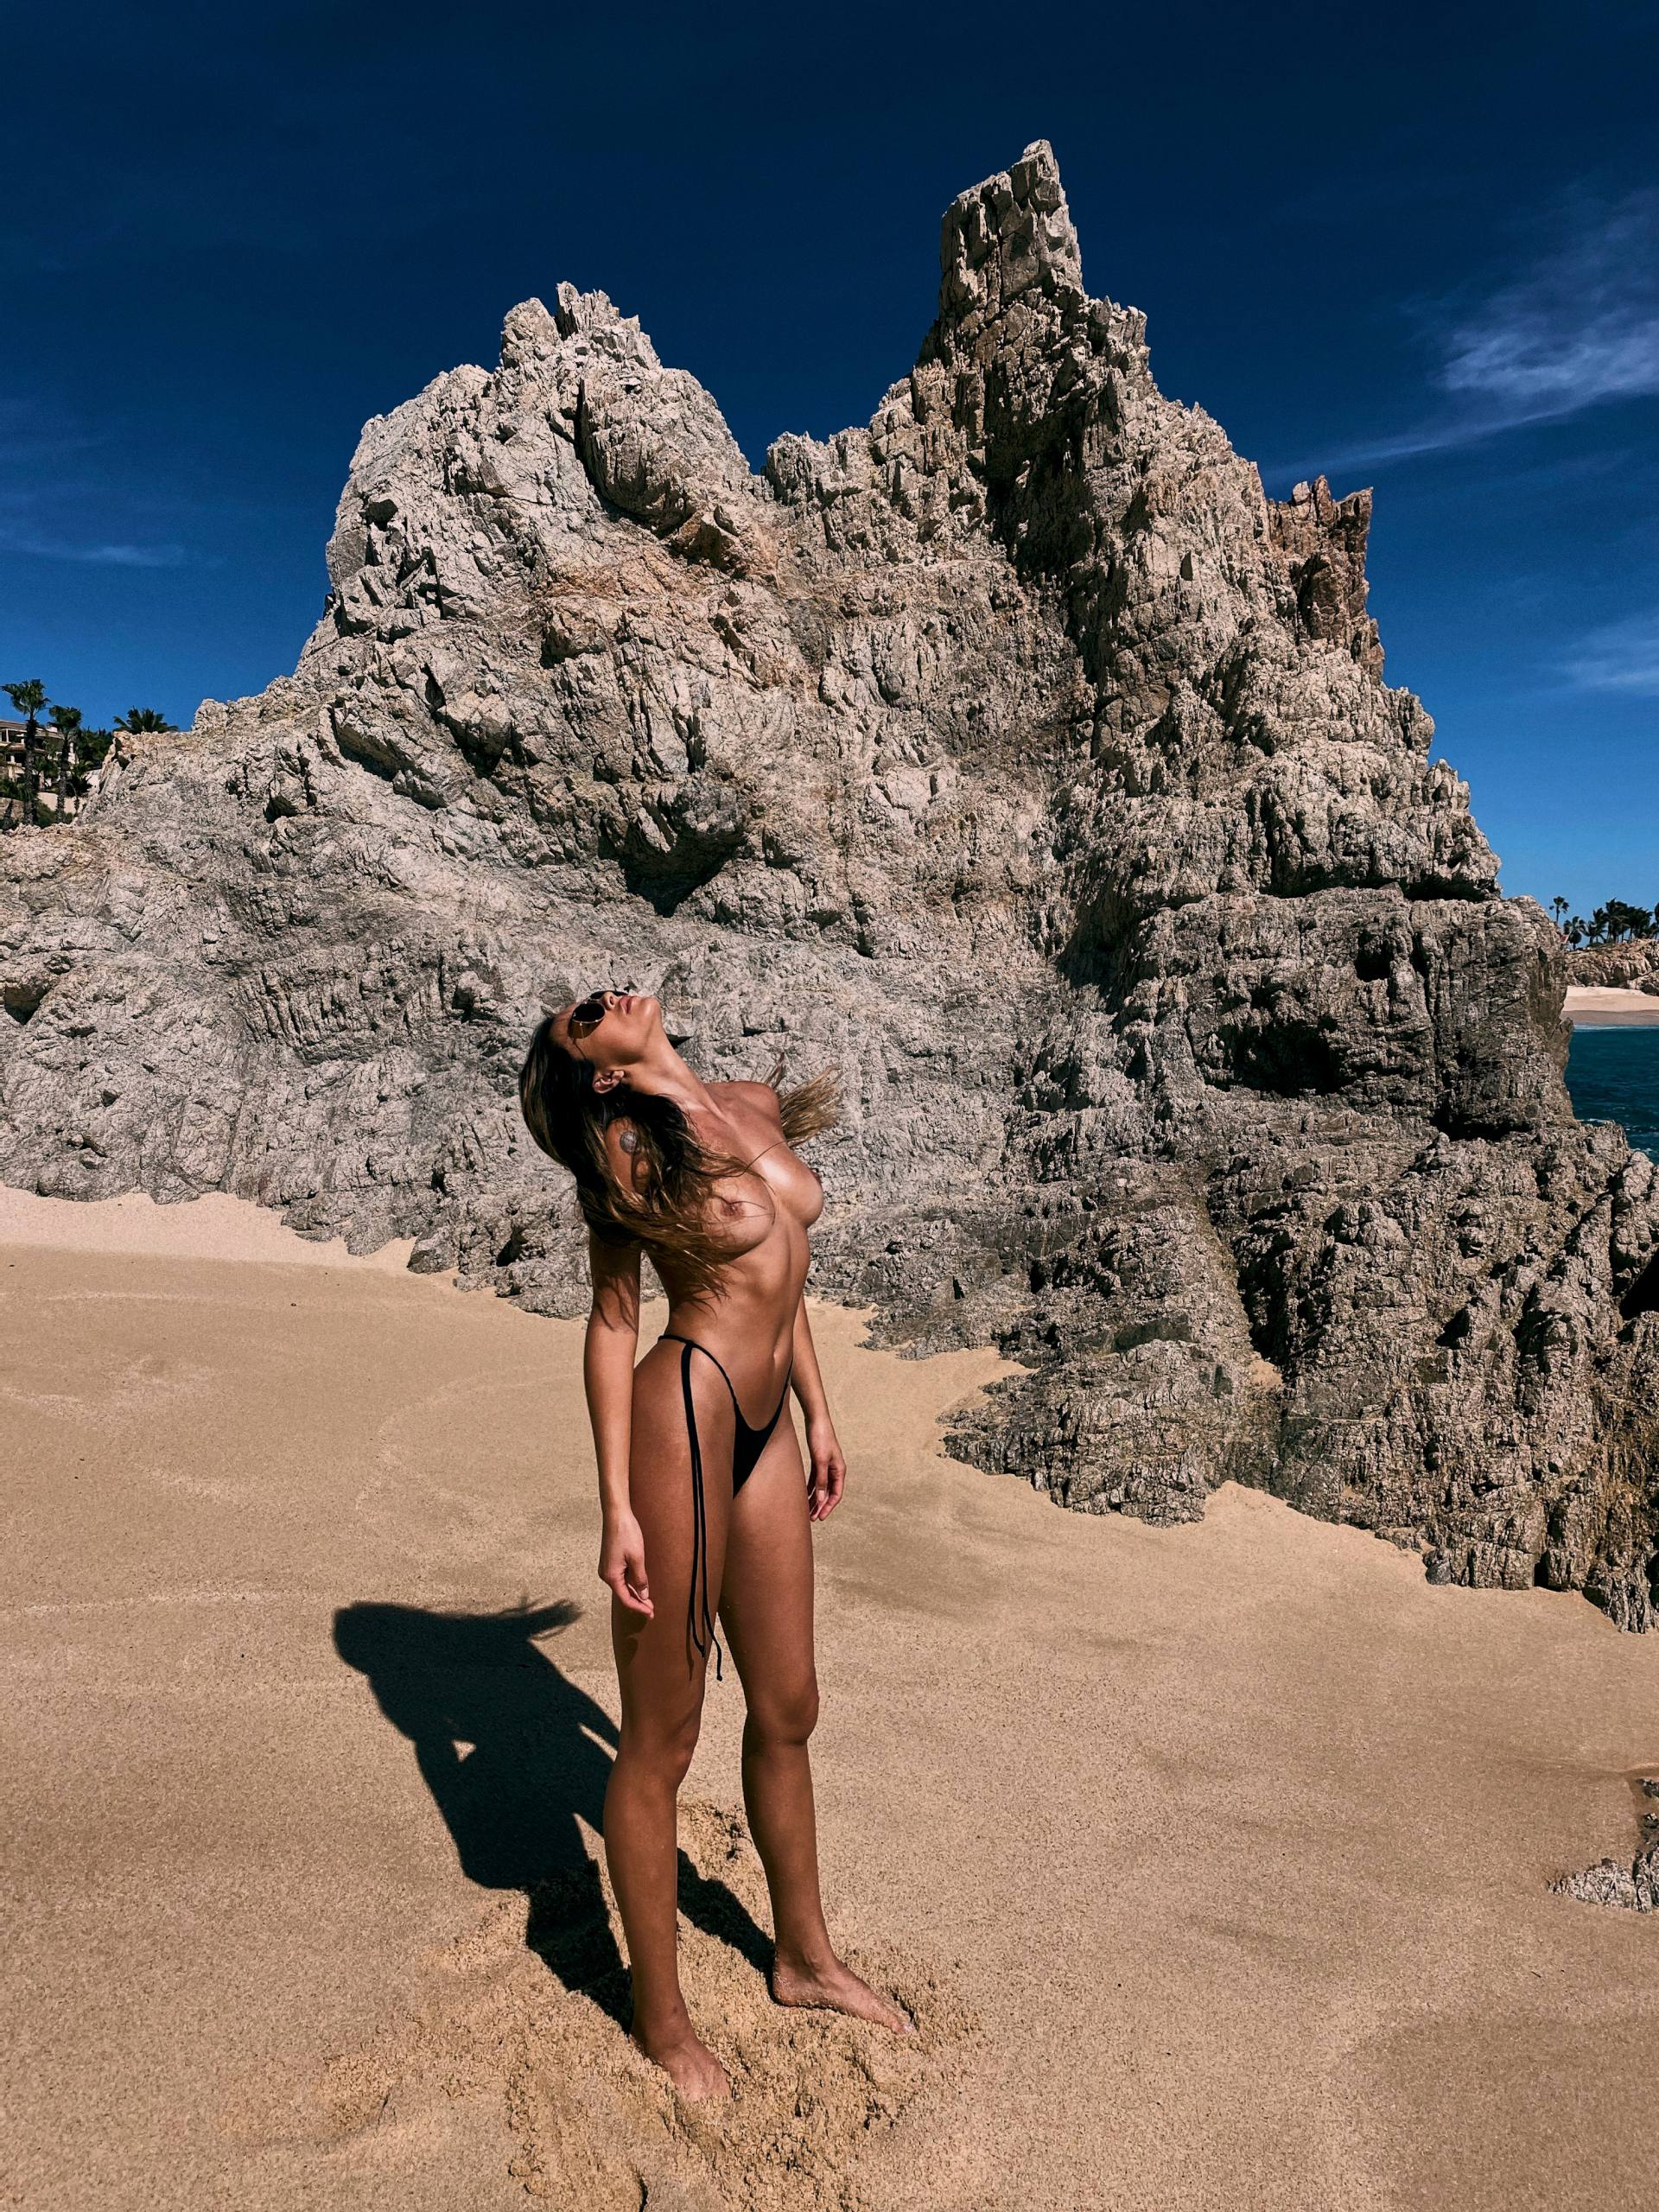 Cherokee Luker – Sexy Boobs In Beautiful Topless Photoshoot By Josh Ryan (nsfw) 0012